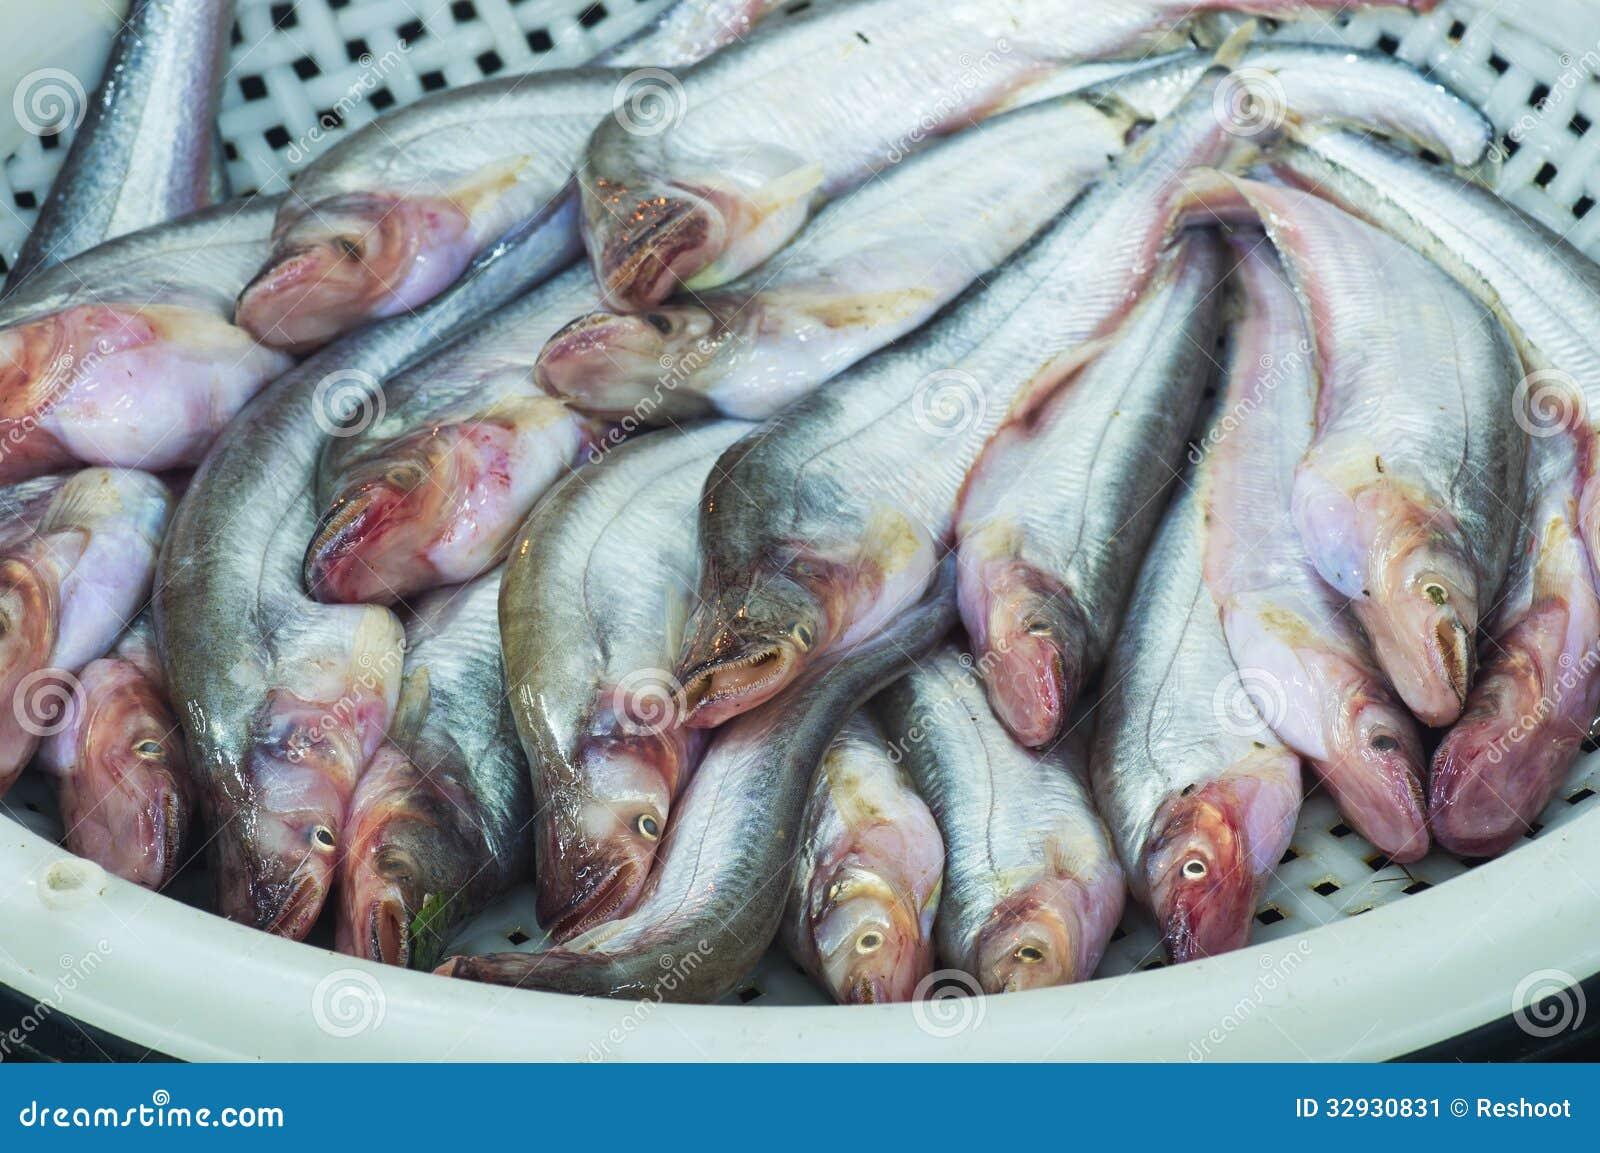 Sheatfish sale at local market,Thailand (Siluridae, Siluriformes).